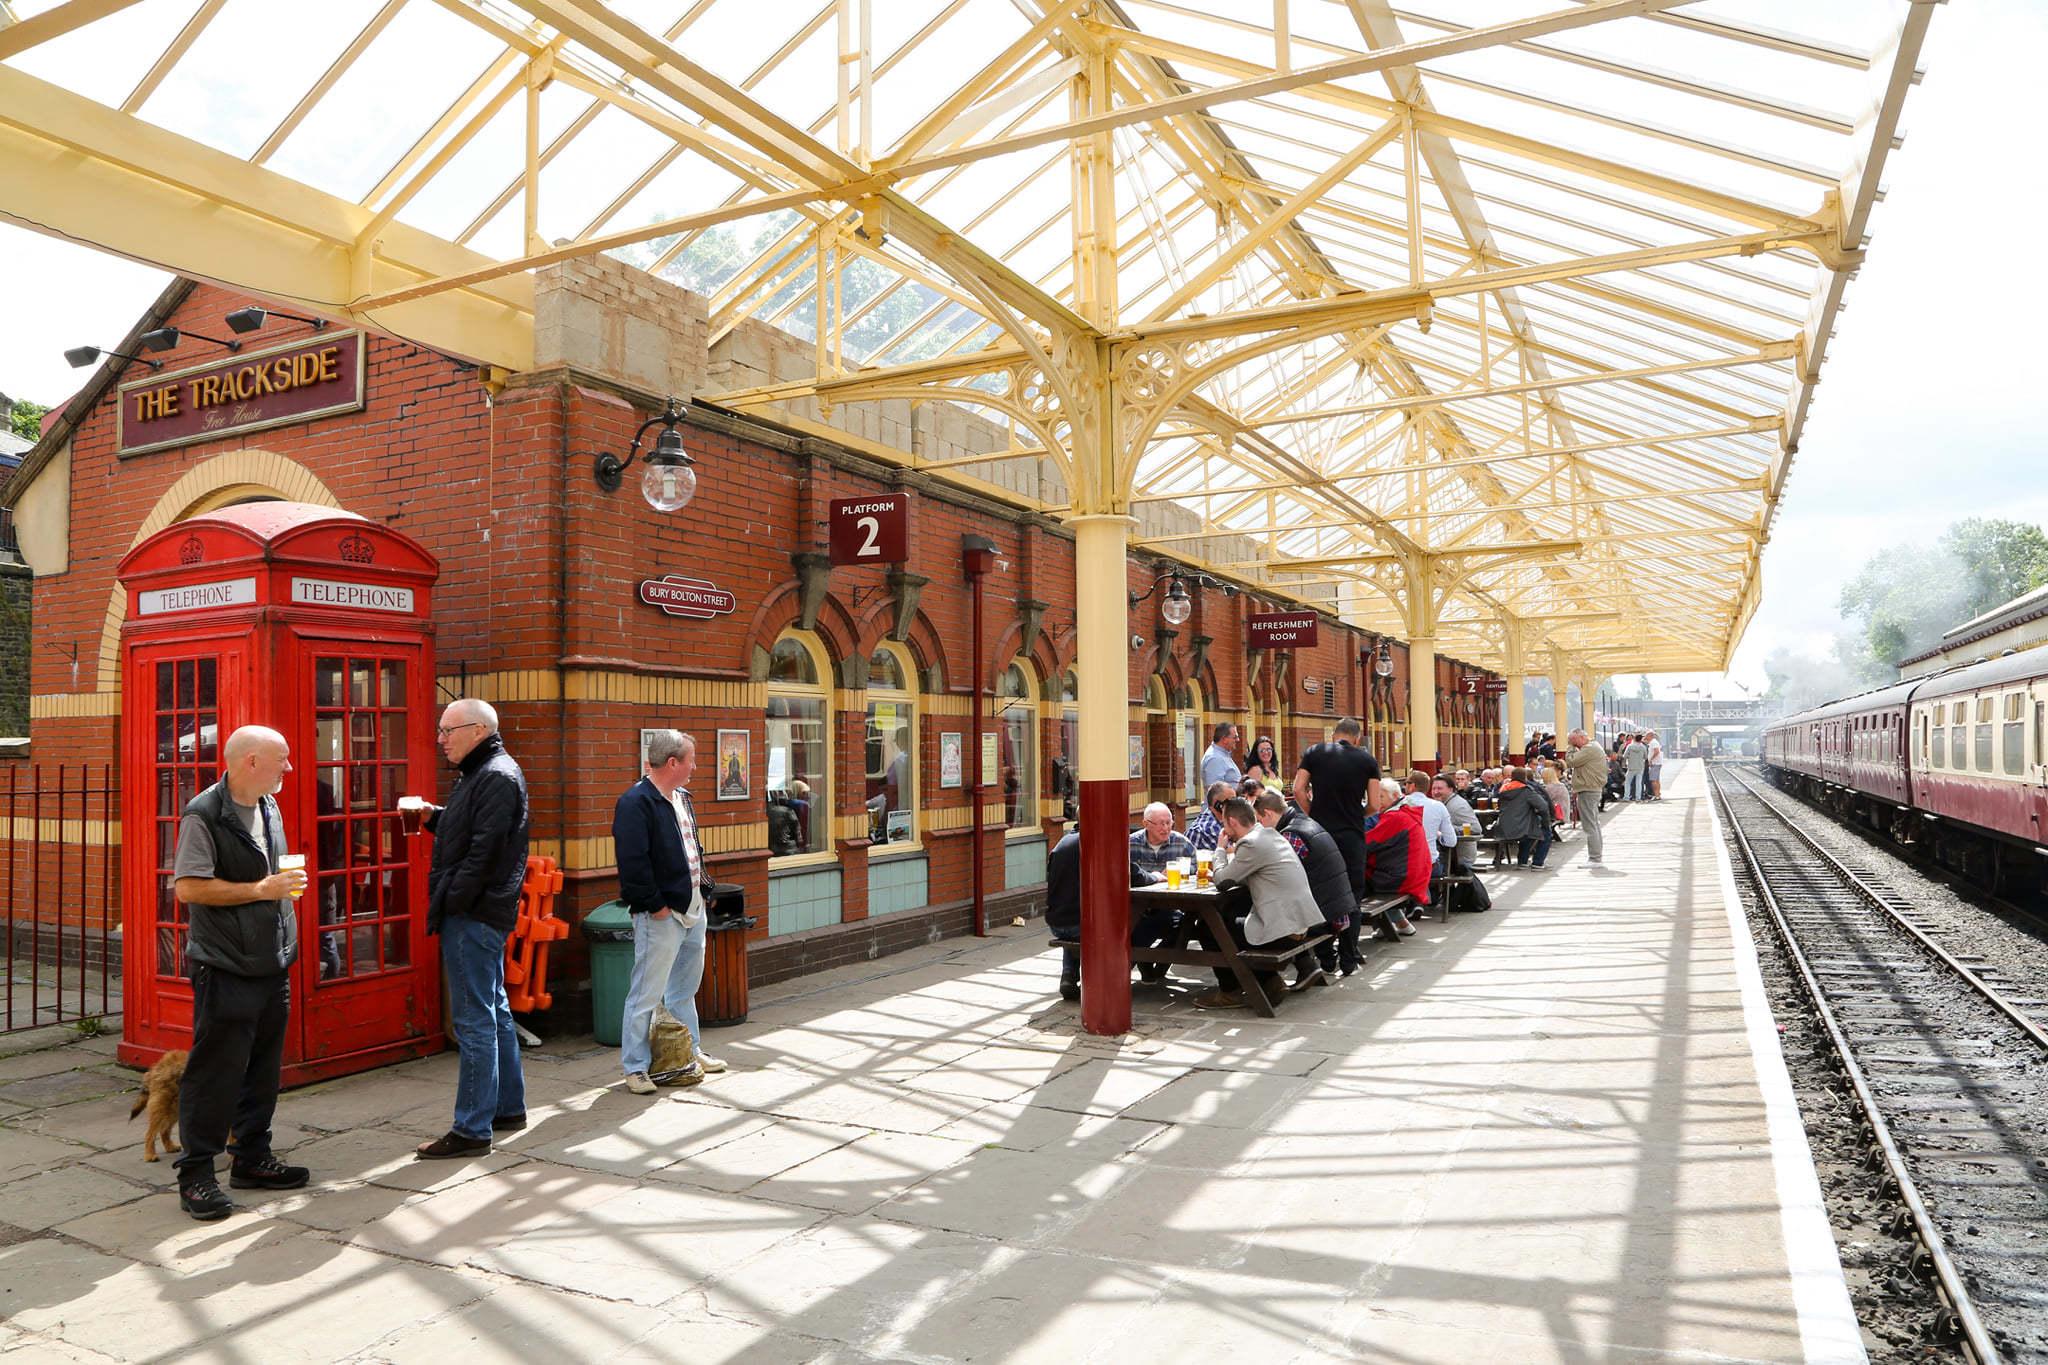 People drinking on a train station platform